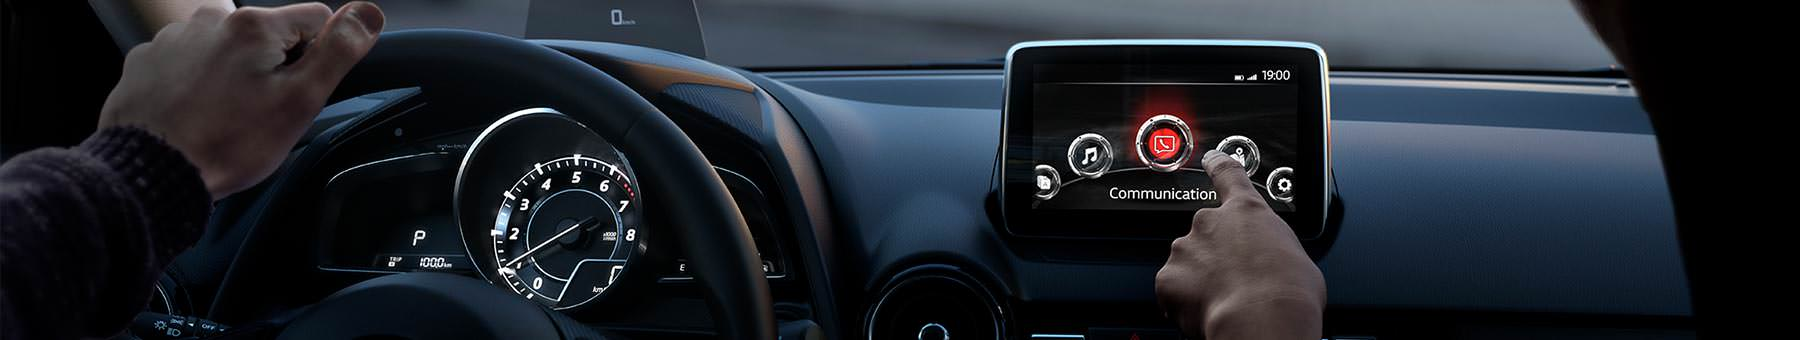 Connectivity | Mazda Ireland